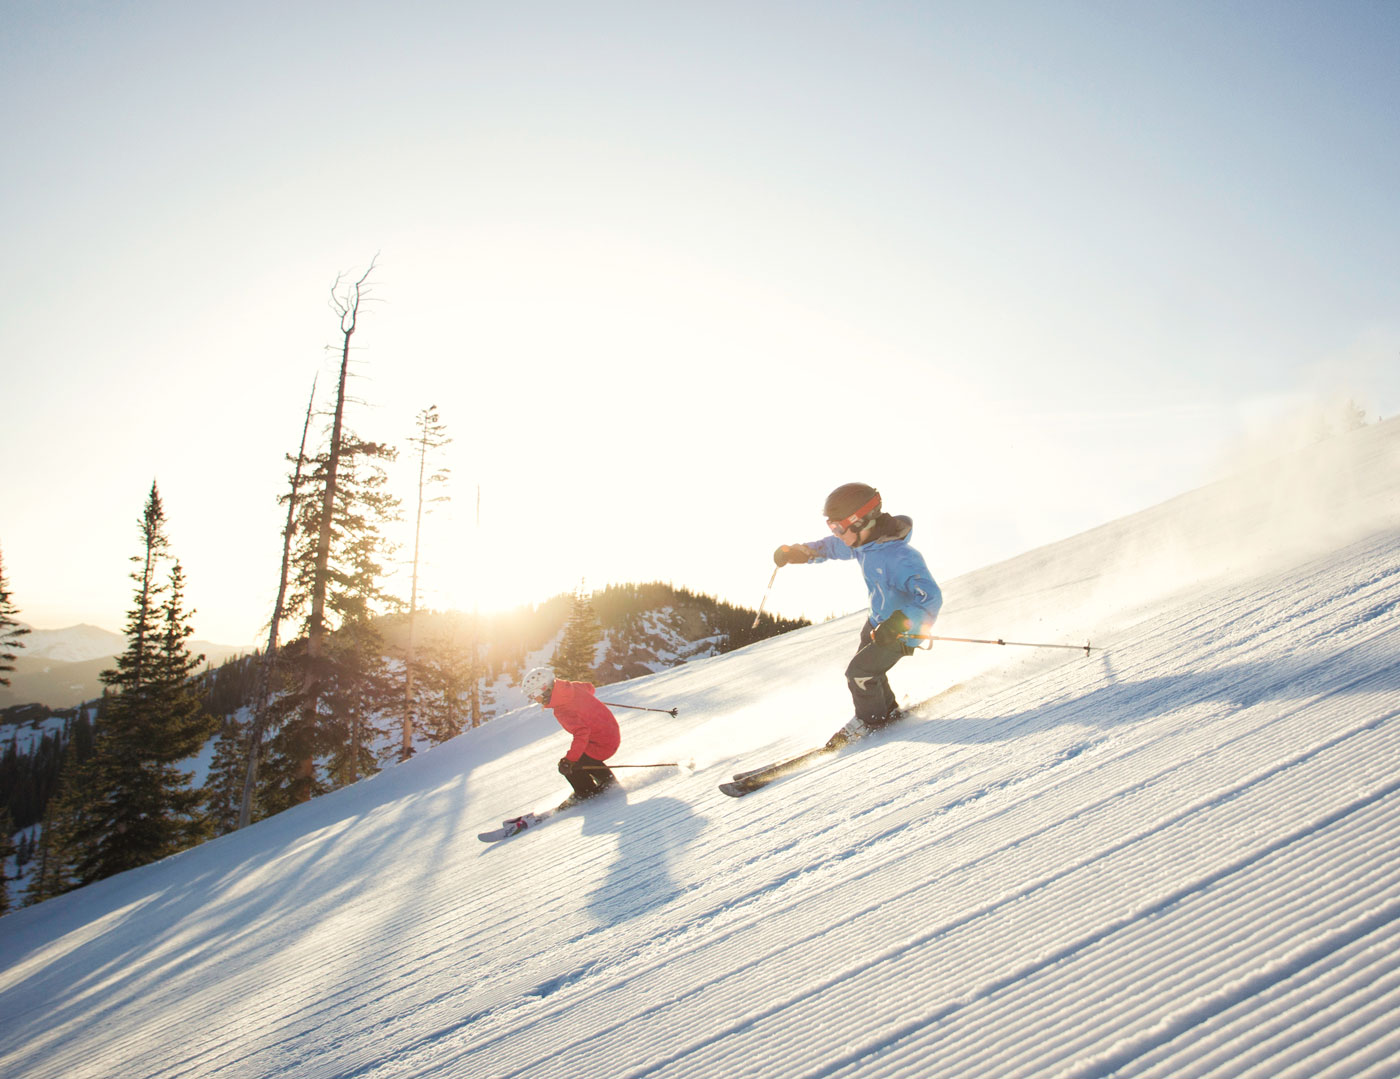 Colorado Ski Resorts Americas Best Skiing Riding Coloradocom - The top 10 destinations for your snowboarding vacation